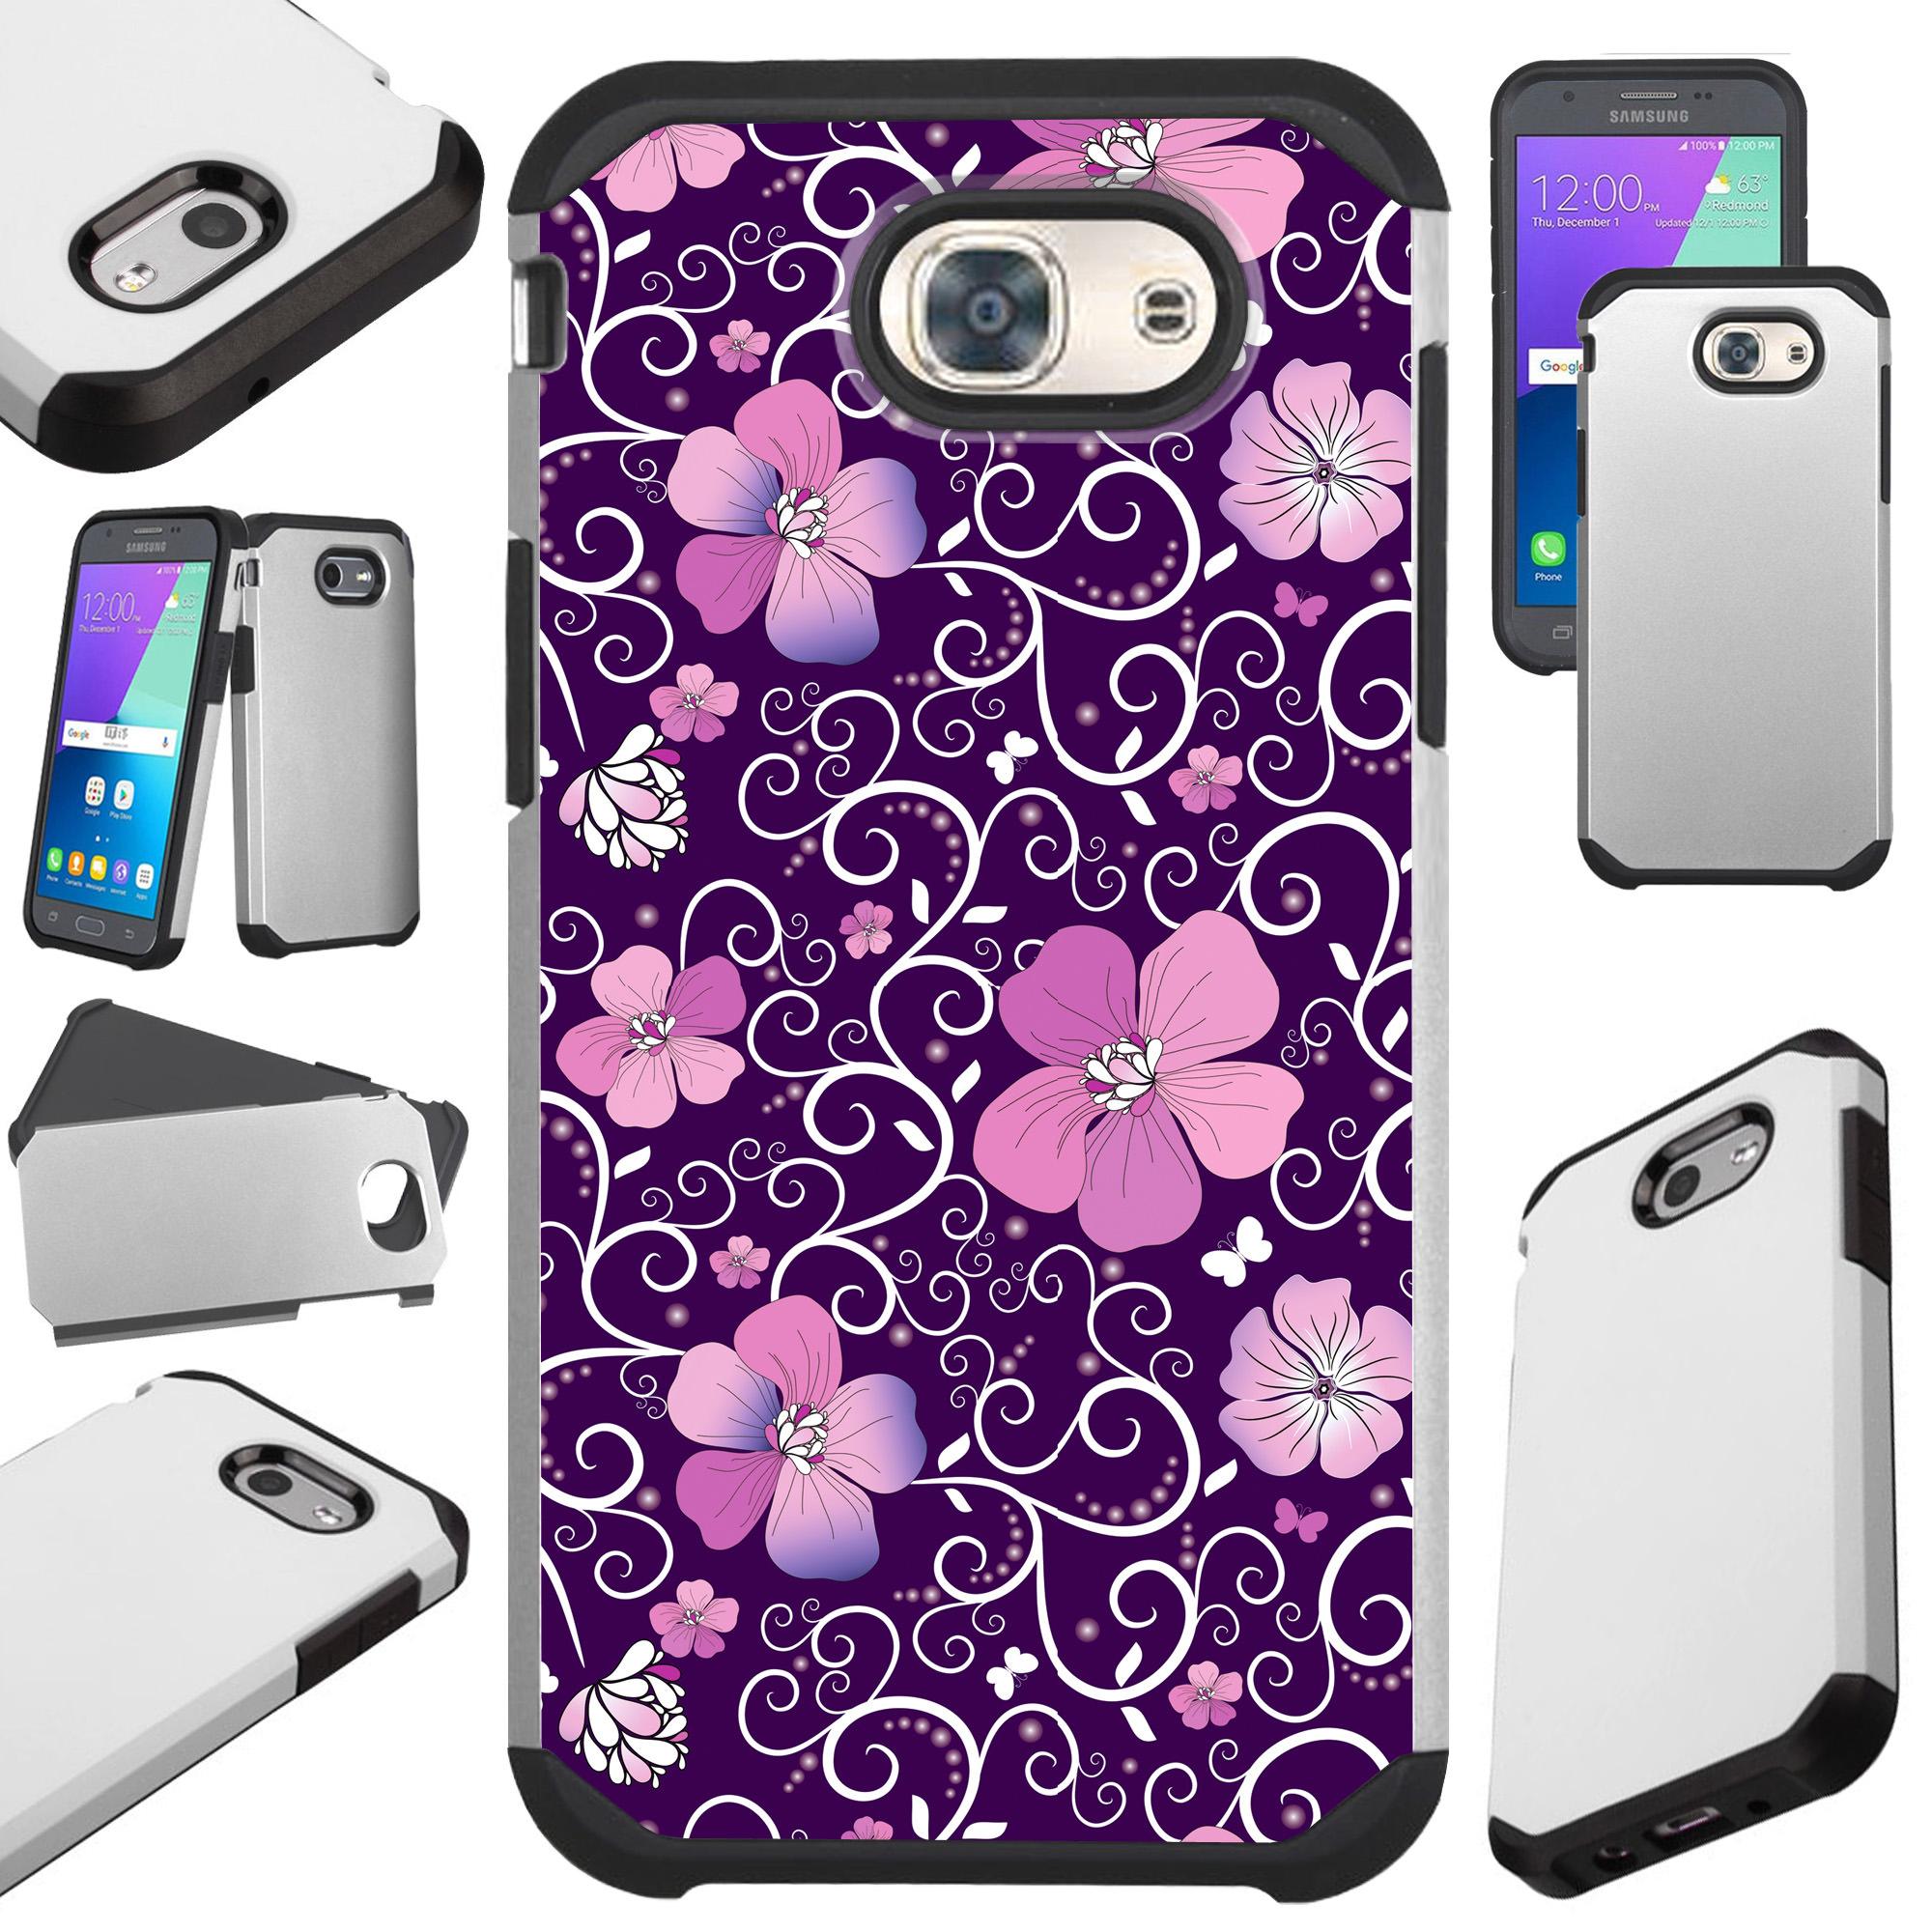 For Samsung Galaxy J7 (2017) / J7V J7 V / J7 Sky Pro / J7 Perx / J7 Prime / Galaxy Halo Case Hybrid TPU Fusion Phone Cover (Purple Flowe Vine)